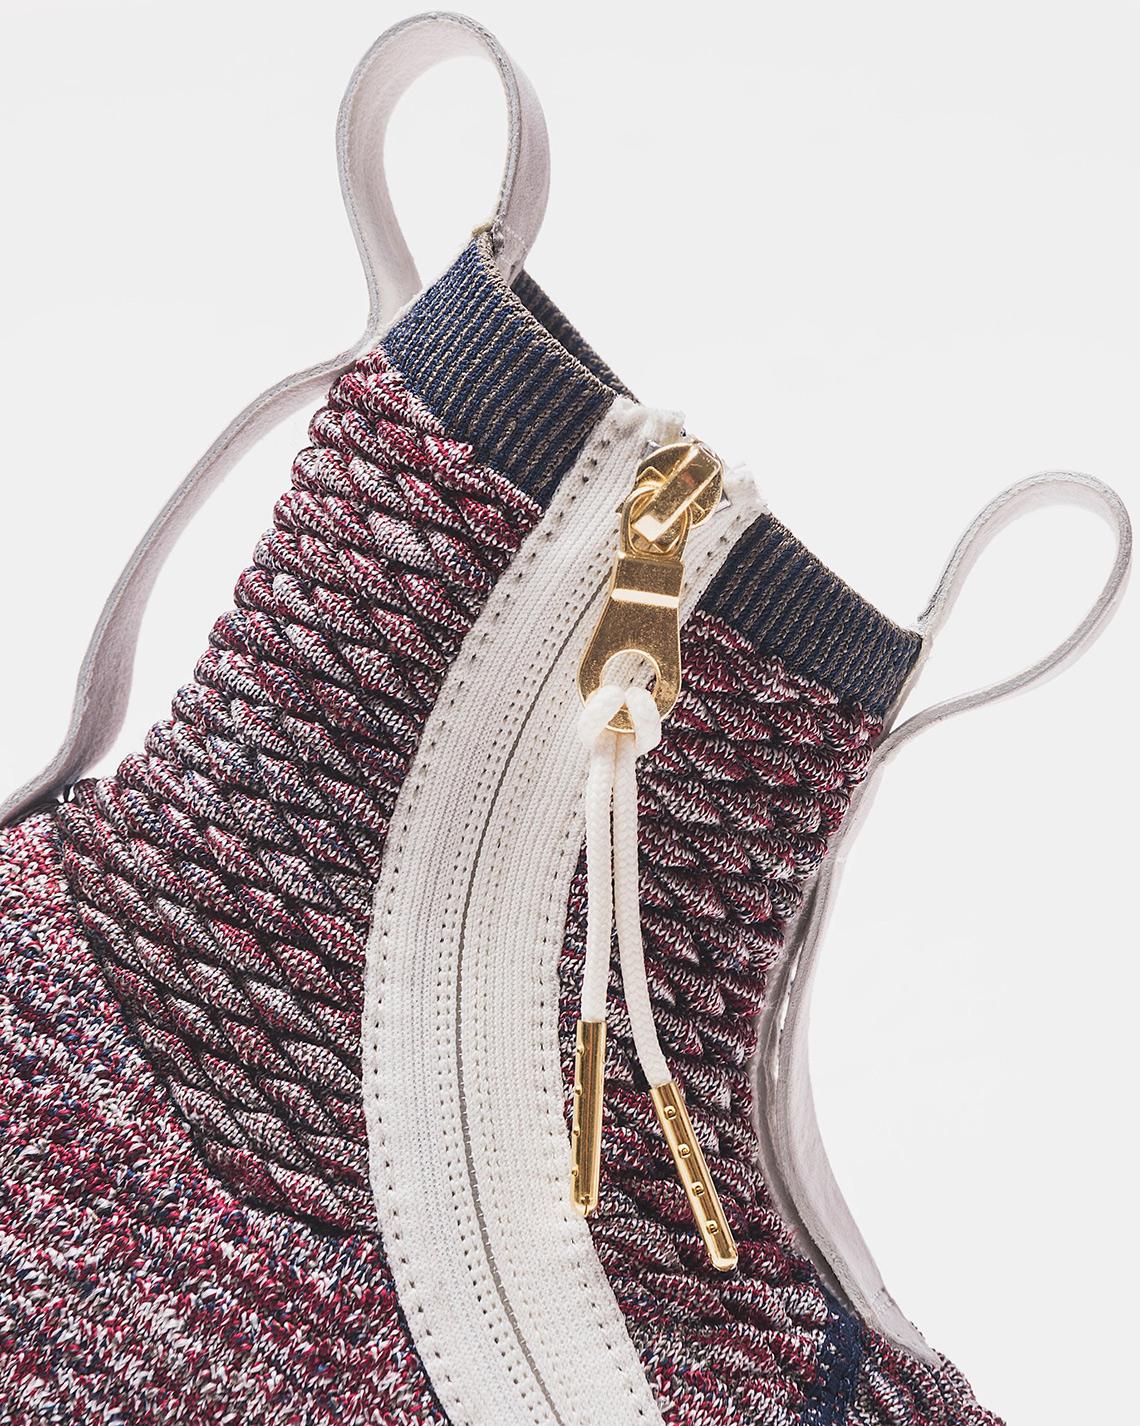 KITH Nike LeBron 15 Preview | SneakerNews.com